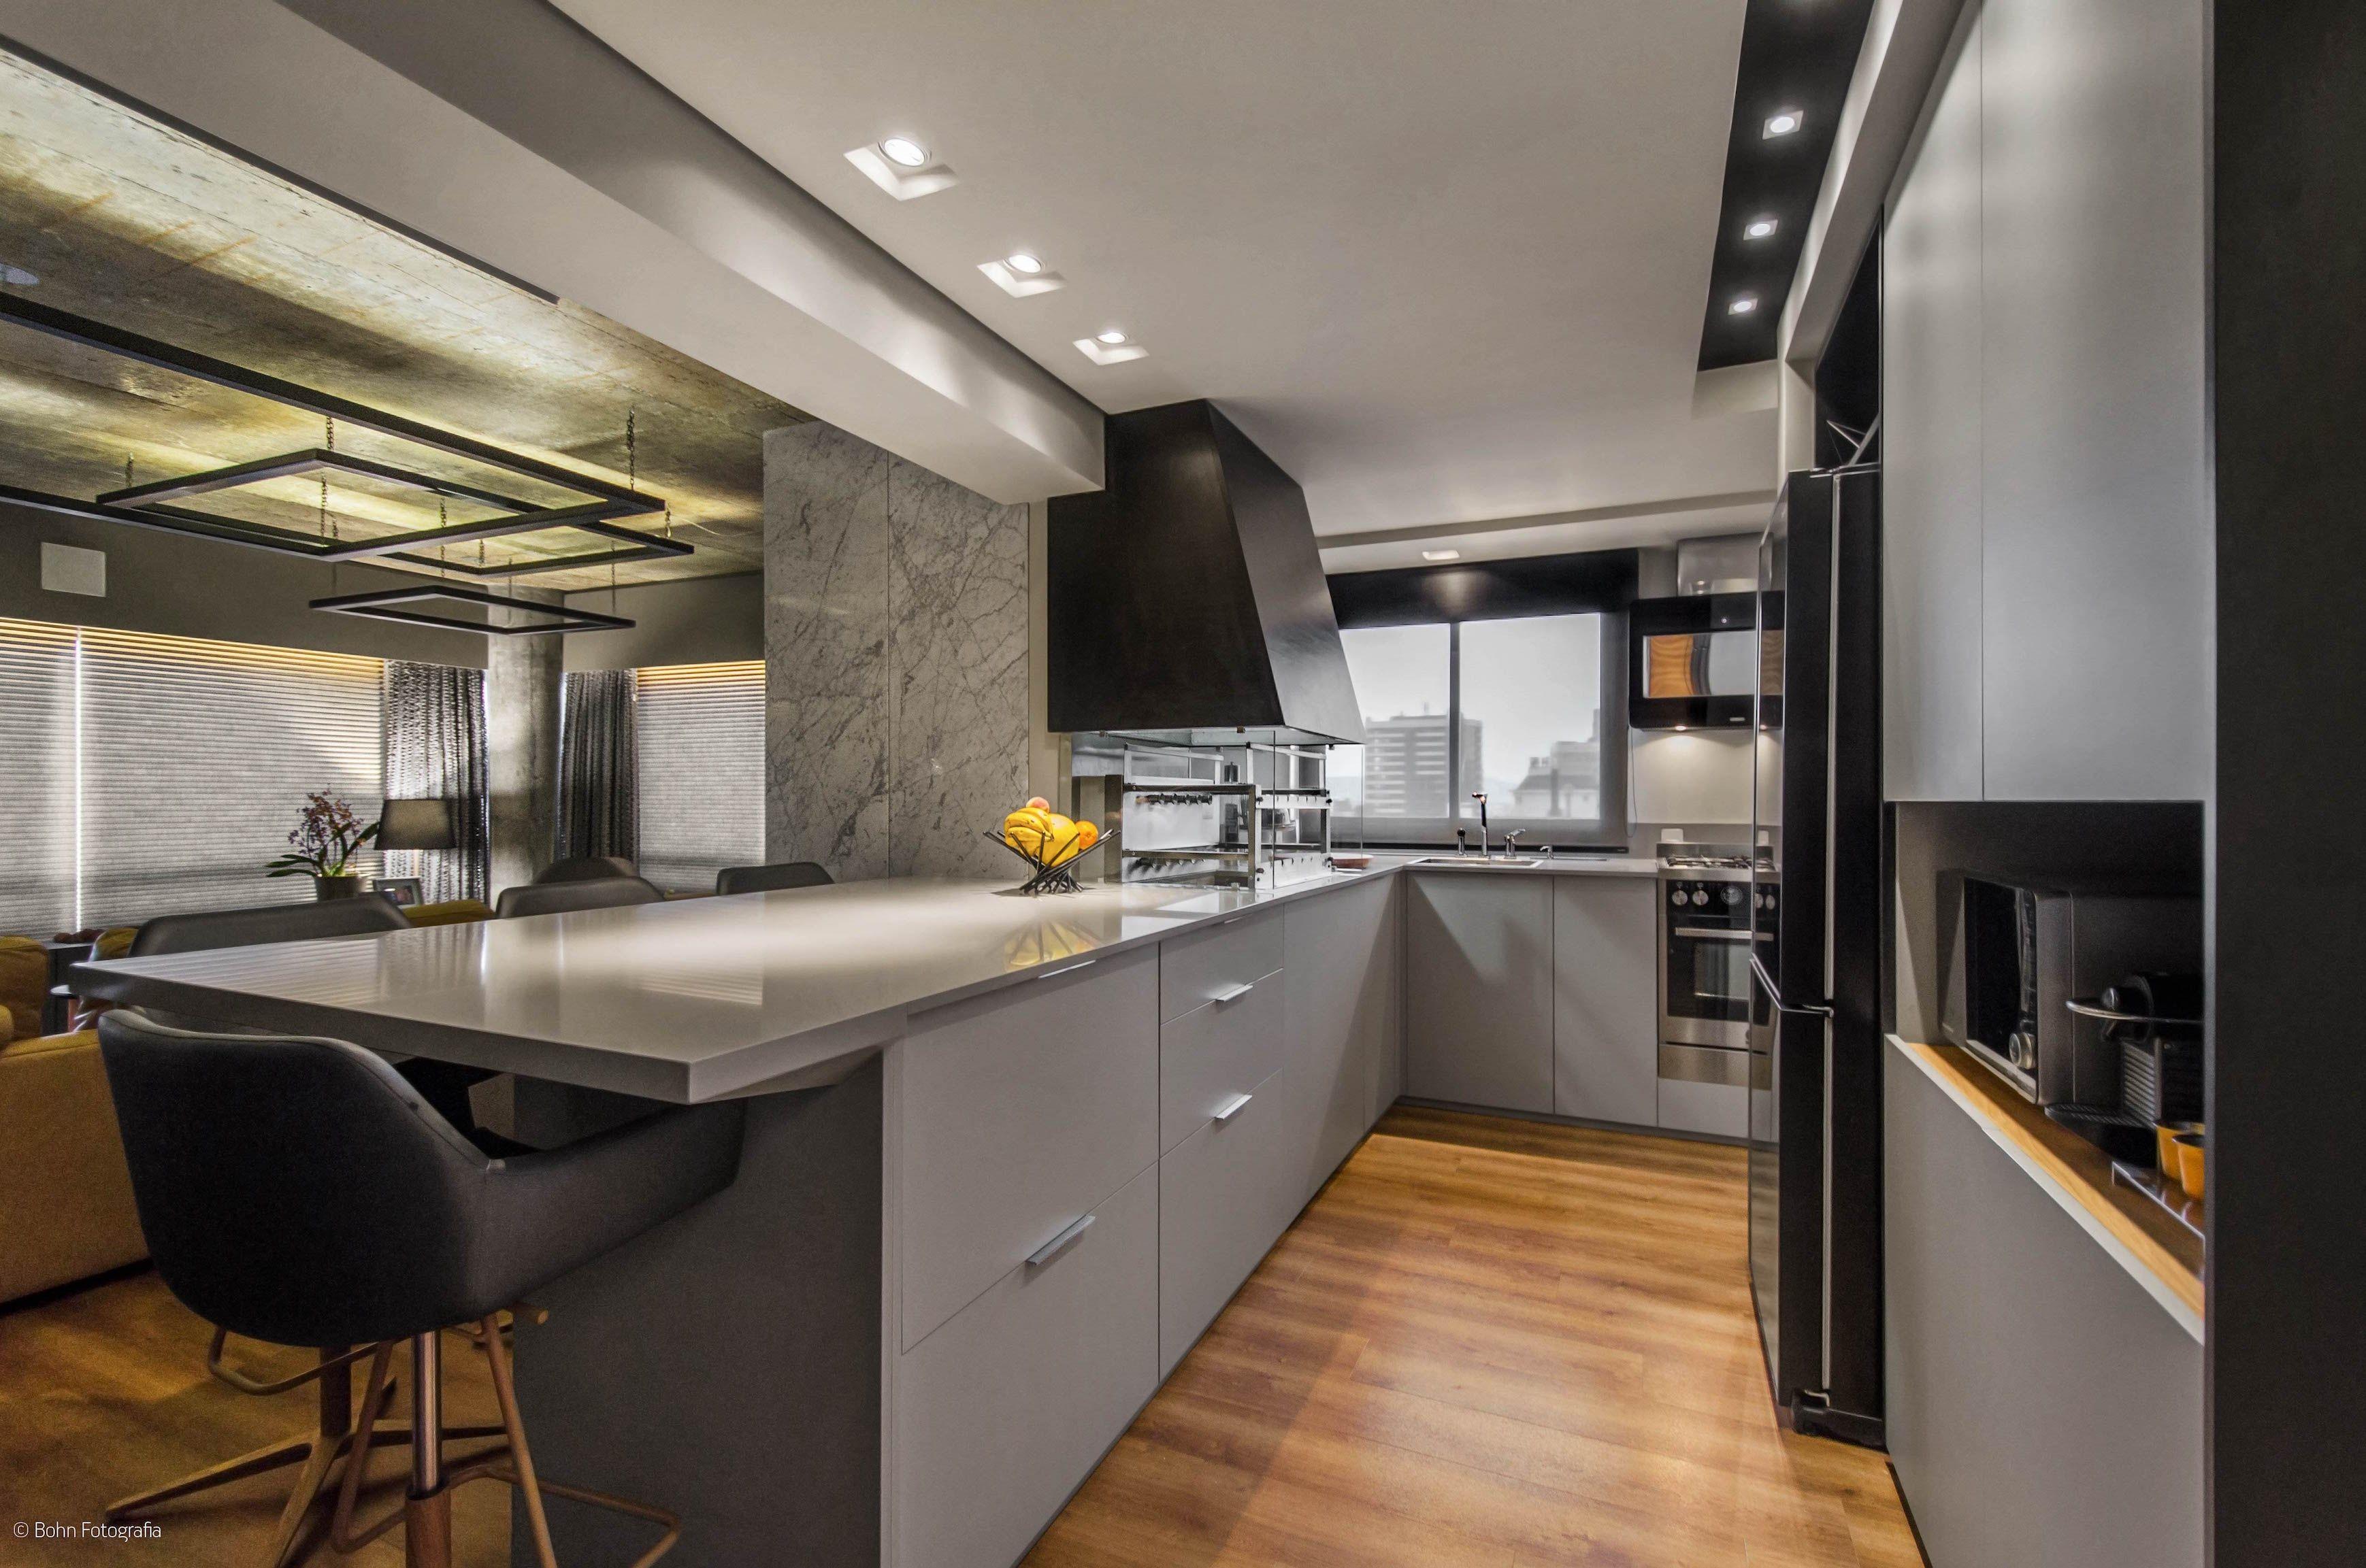 Silestone GEDATSU   Kitchens Silestone by Cosentino   Pinterest ...